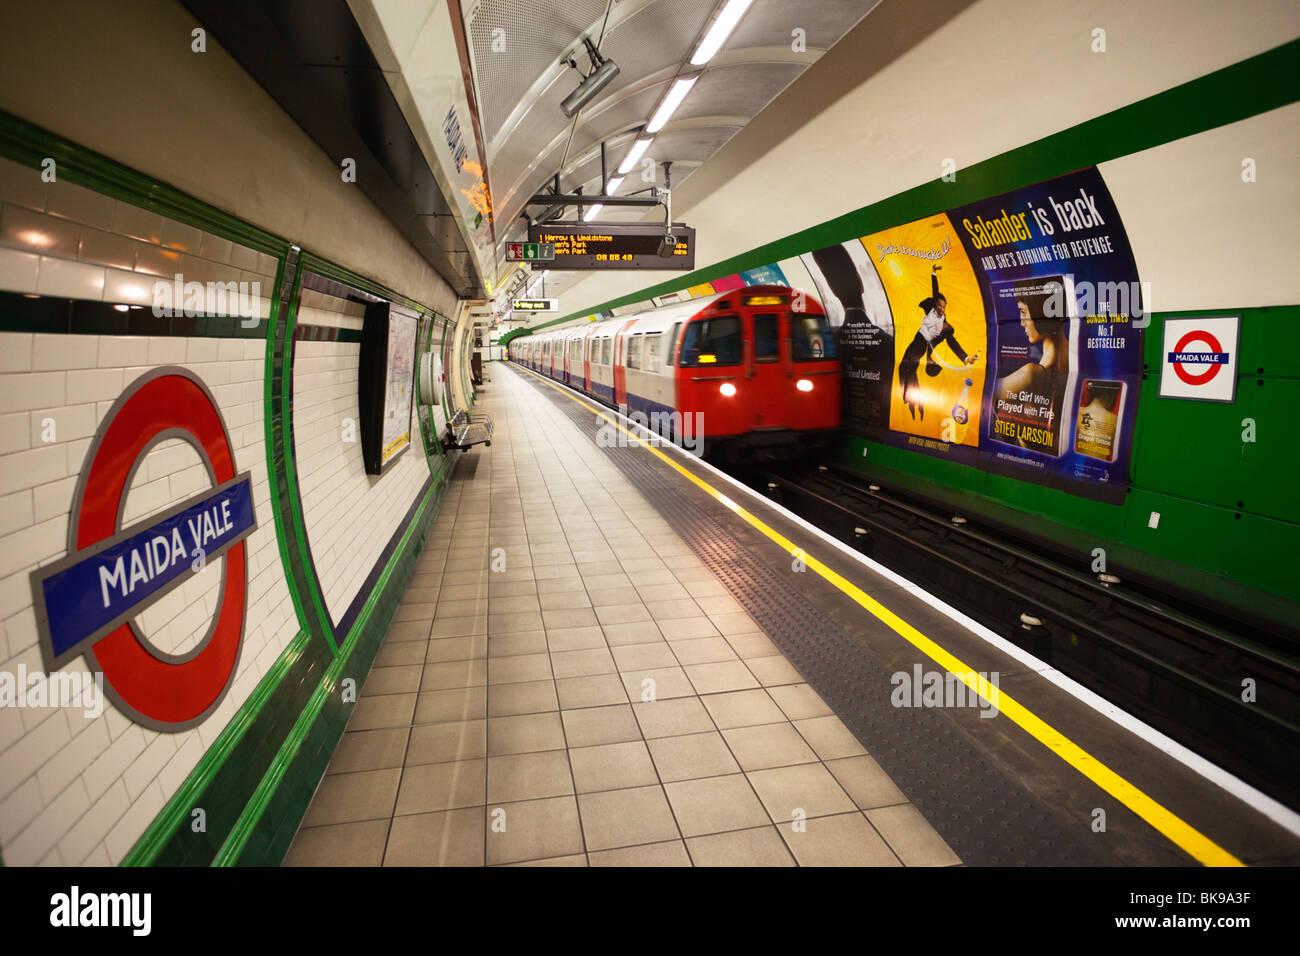 Train at a subway station, London Underground, London, England - Stock Image